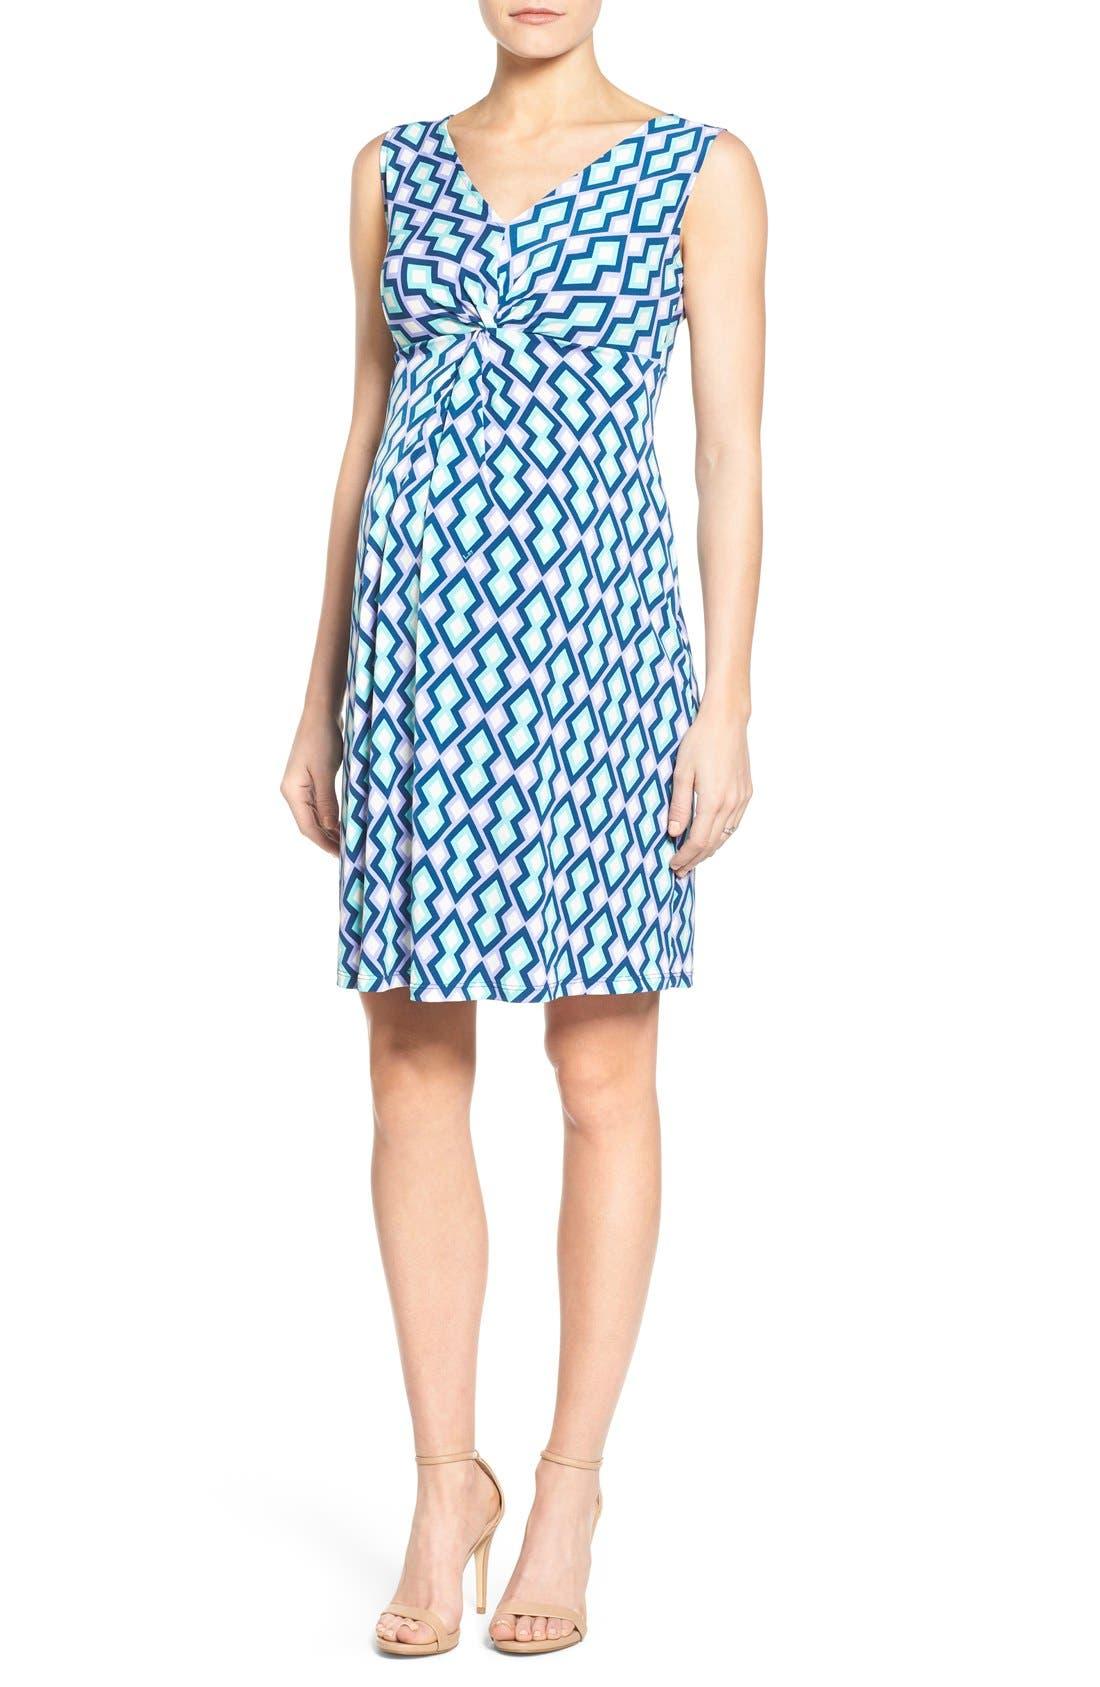 Alternate Image 1 Selected - Leota Sleeveless Maternity Dress